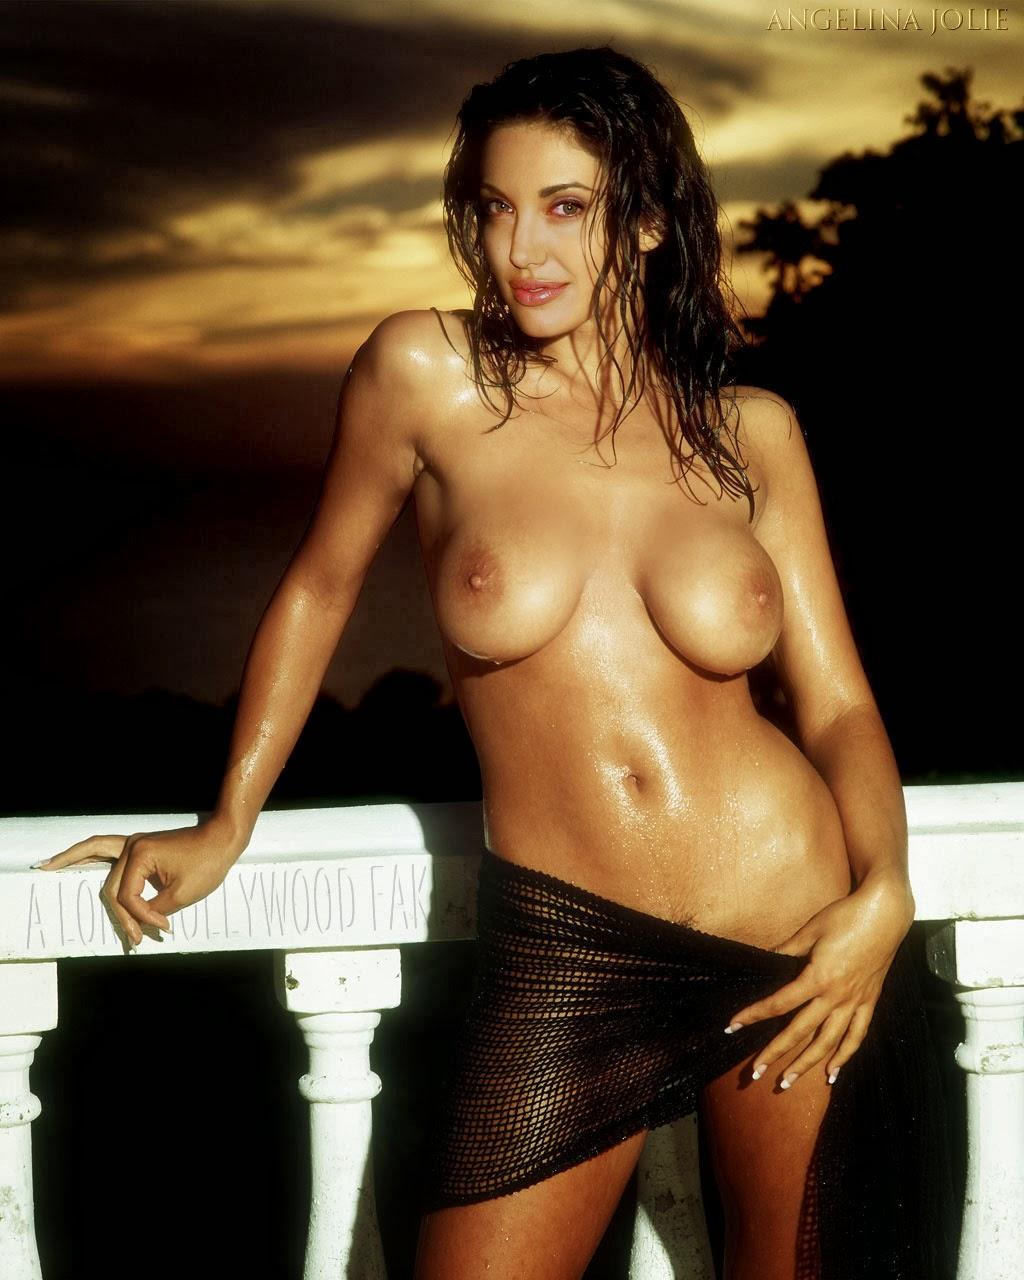 Nude Angelina Jolie S Vagina  C2 B7 Bollywood Nudes Free Porn